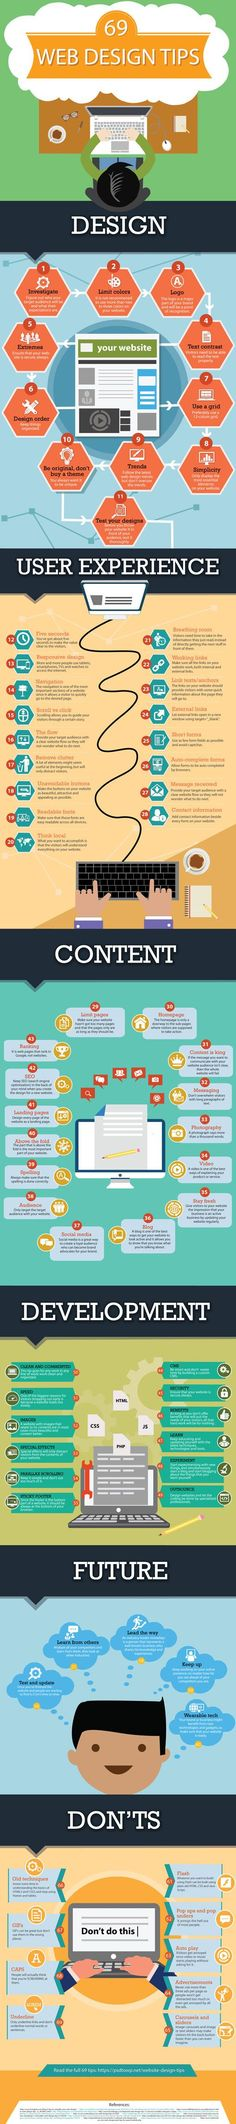 Infographic: 69 Web Design Tips . - Infographic: 69 Web Design Tips More - {hashtag} Web And App Design, Web Design Trends, Design Websites, Graphisches Design, Web Design Tips, Logo Design, Layout Design, Design Ideas, Ecommerce Websites